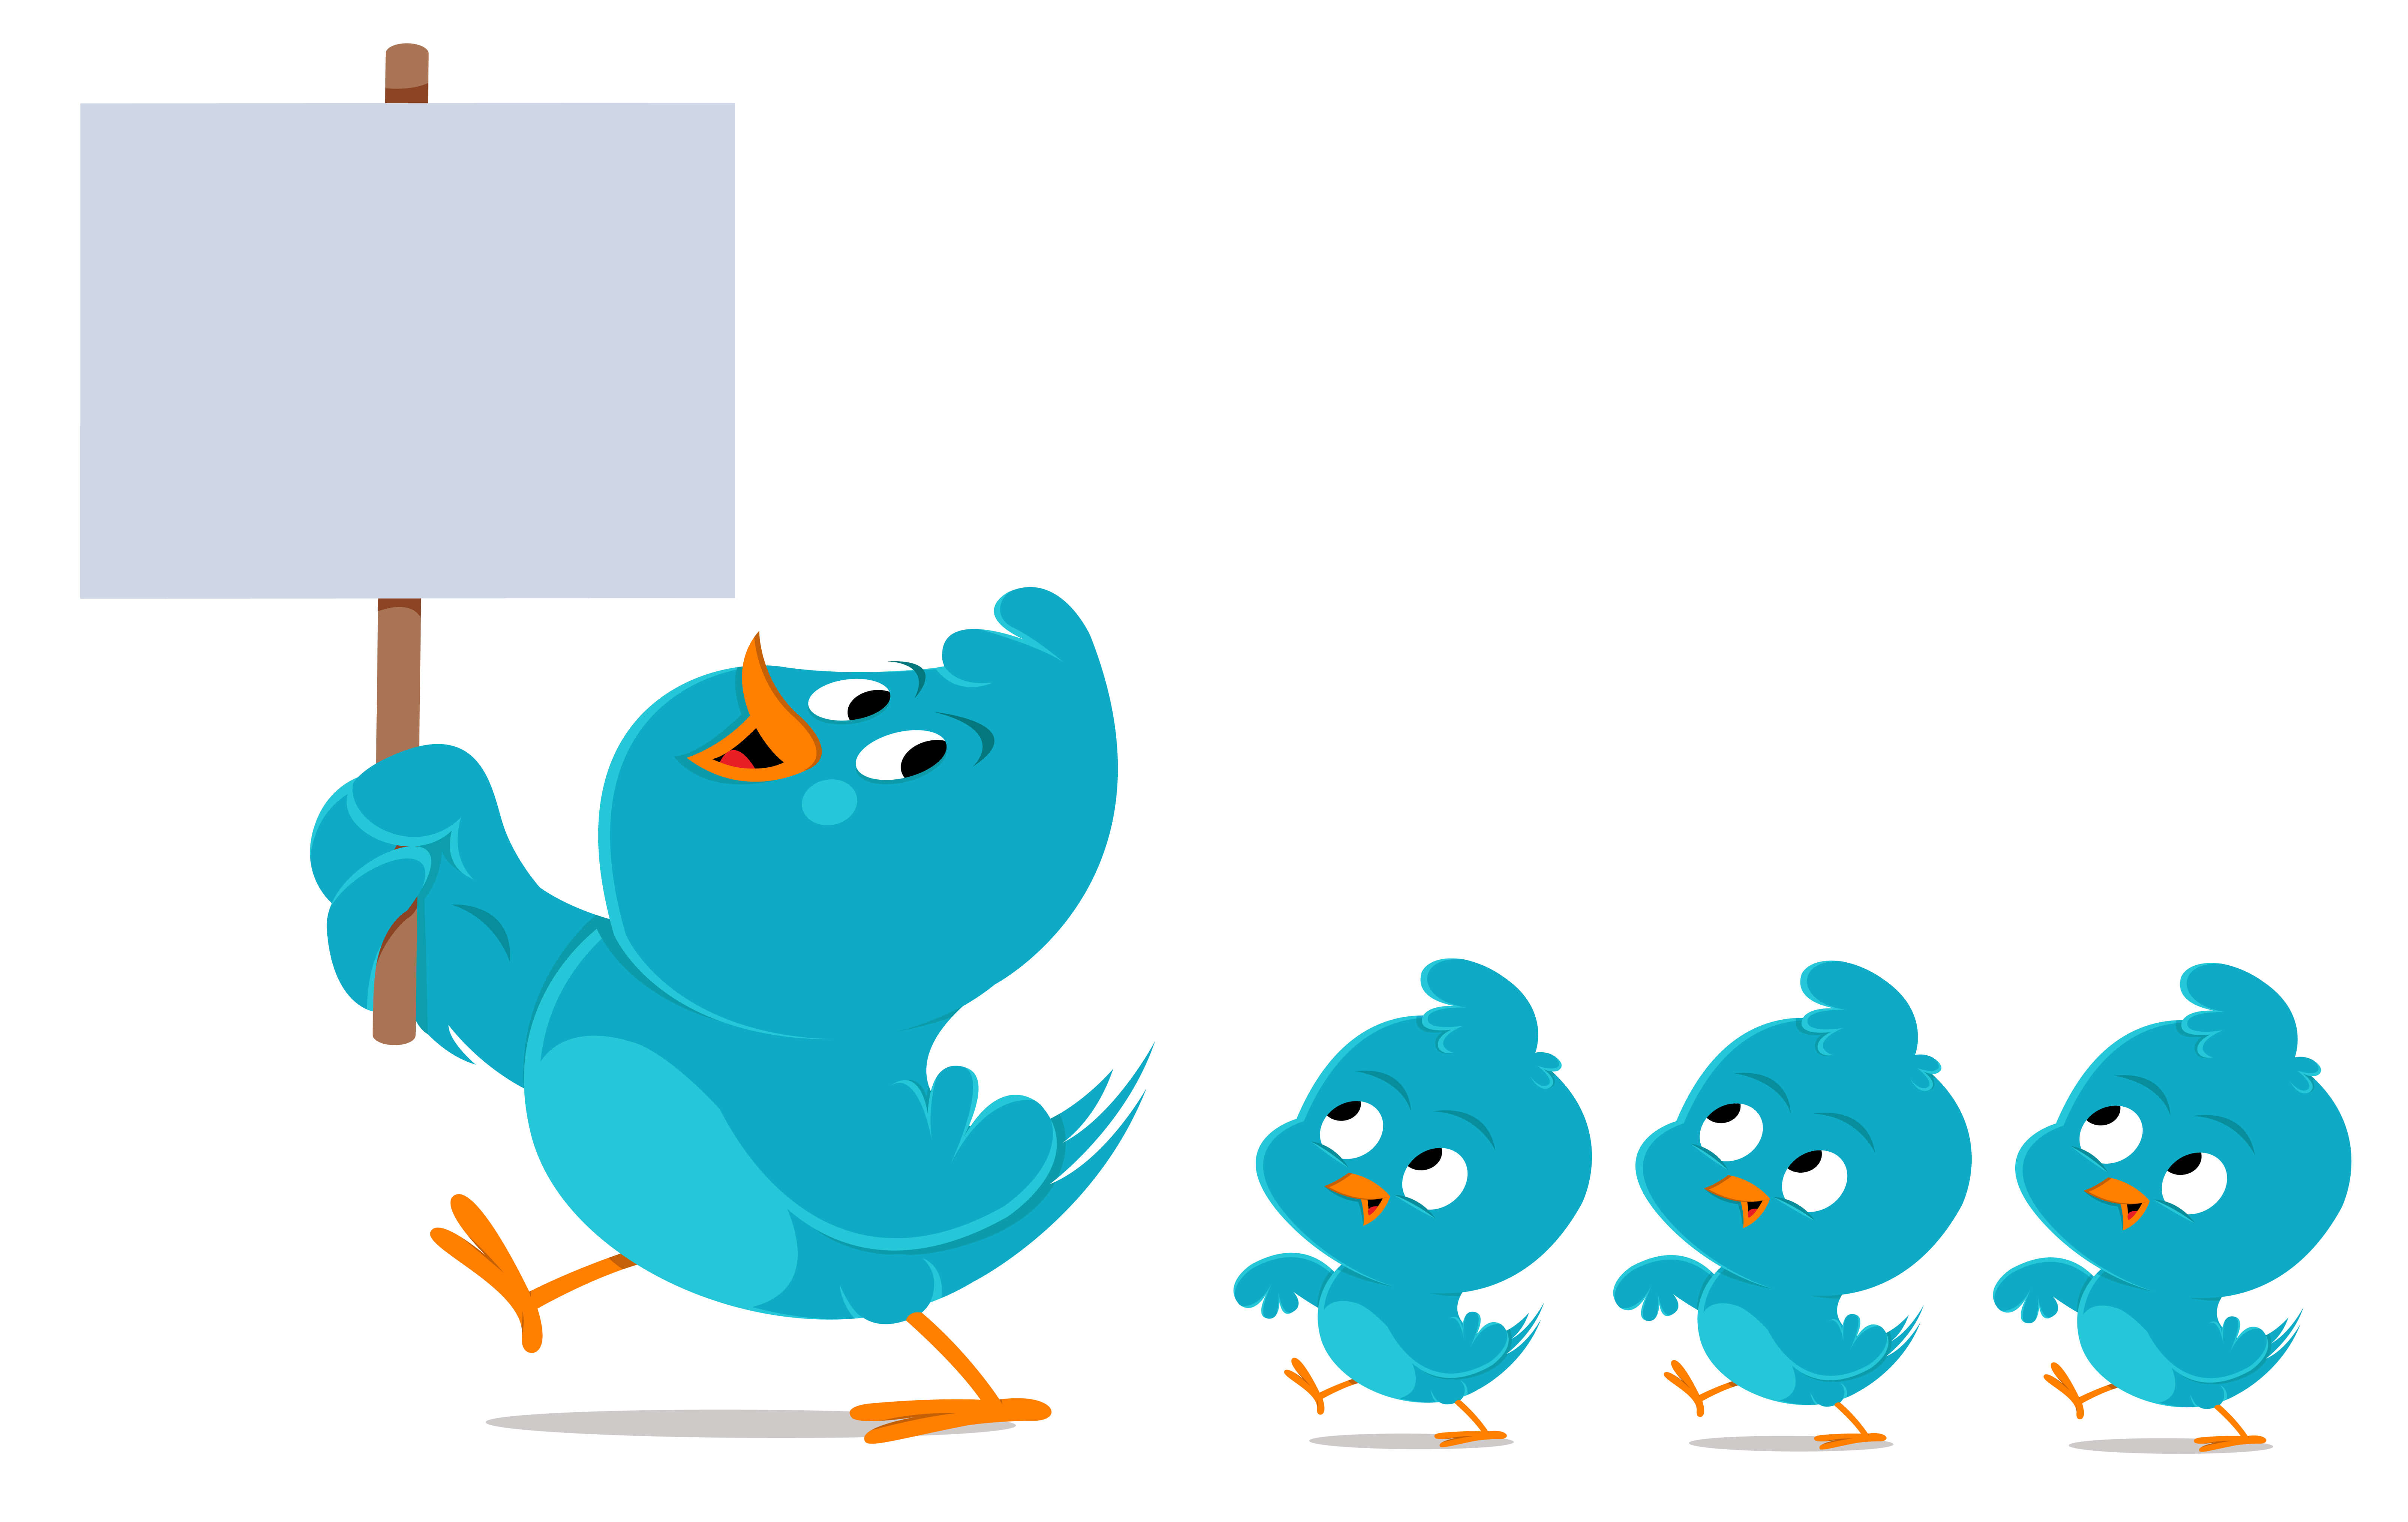 estrategia-para-conseguir-seguidores-en-twitter1